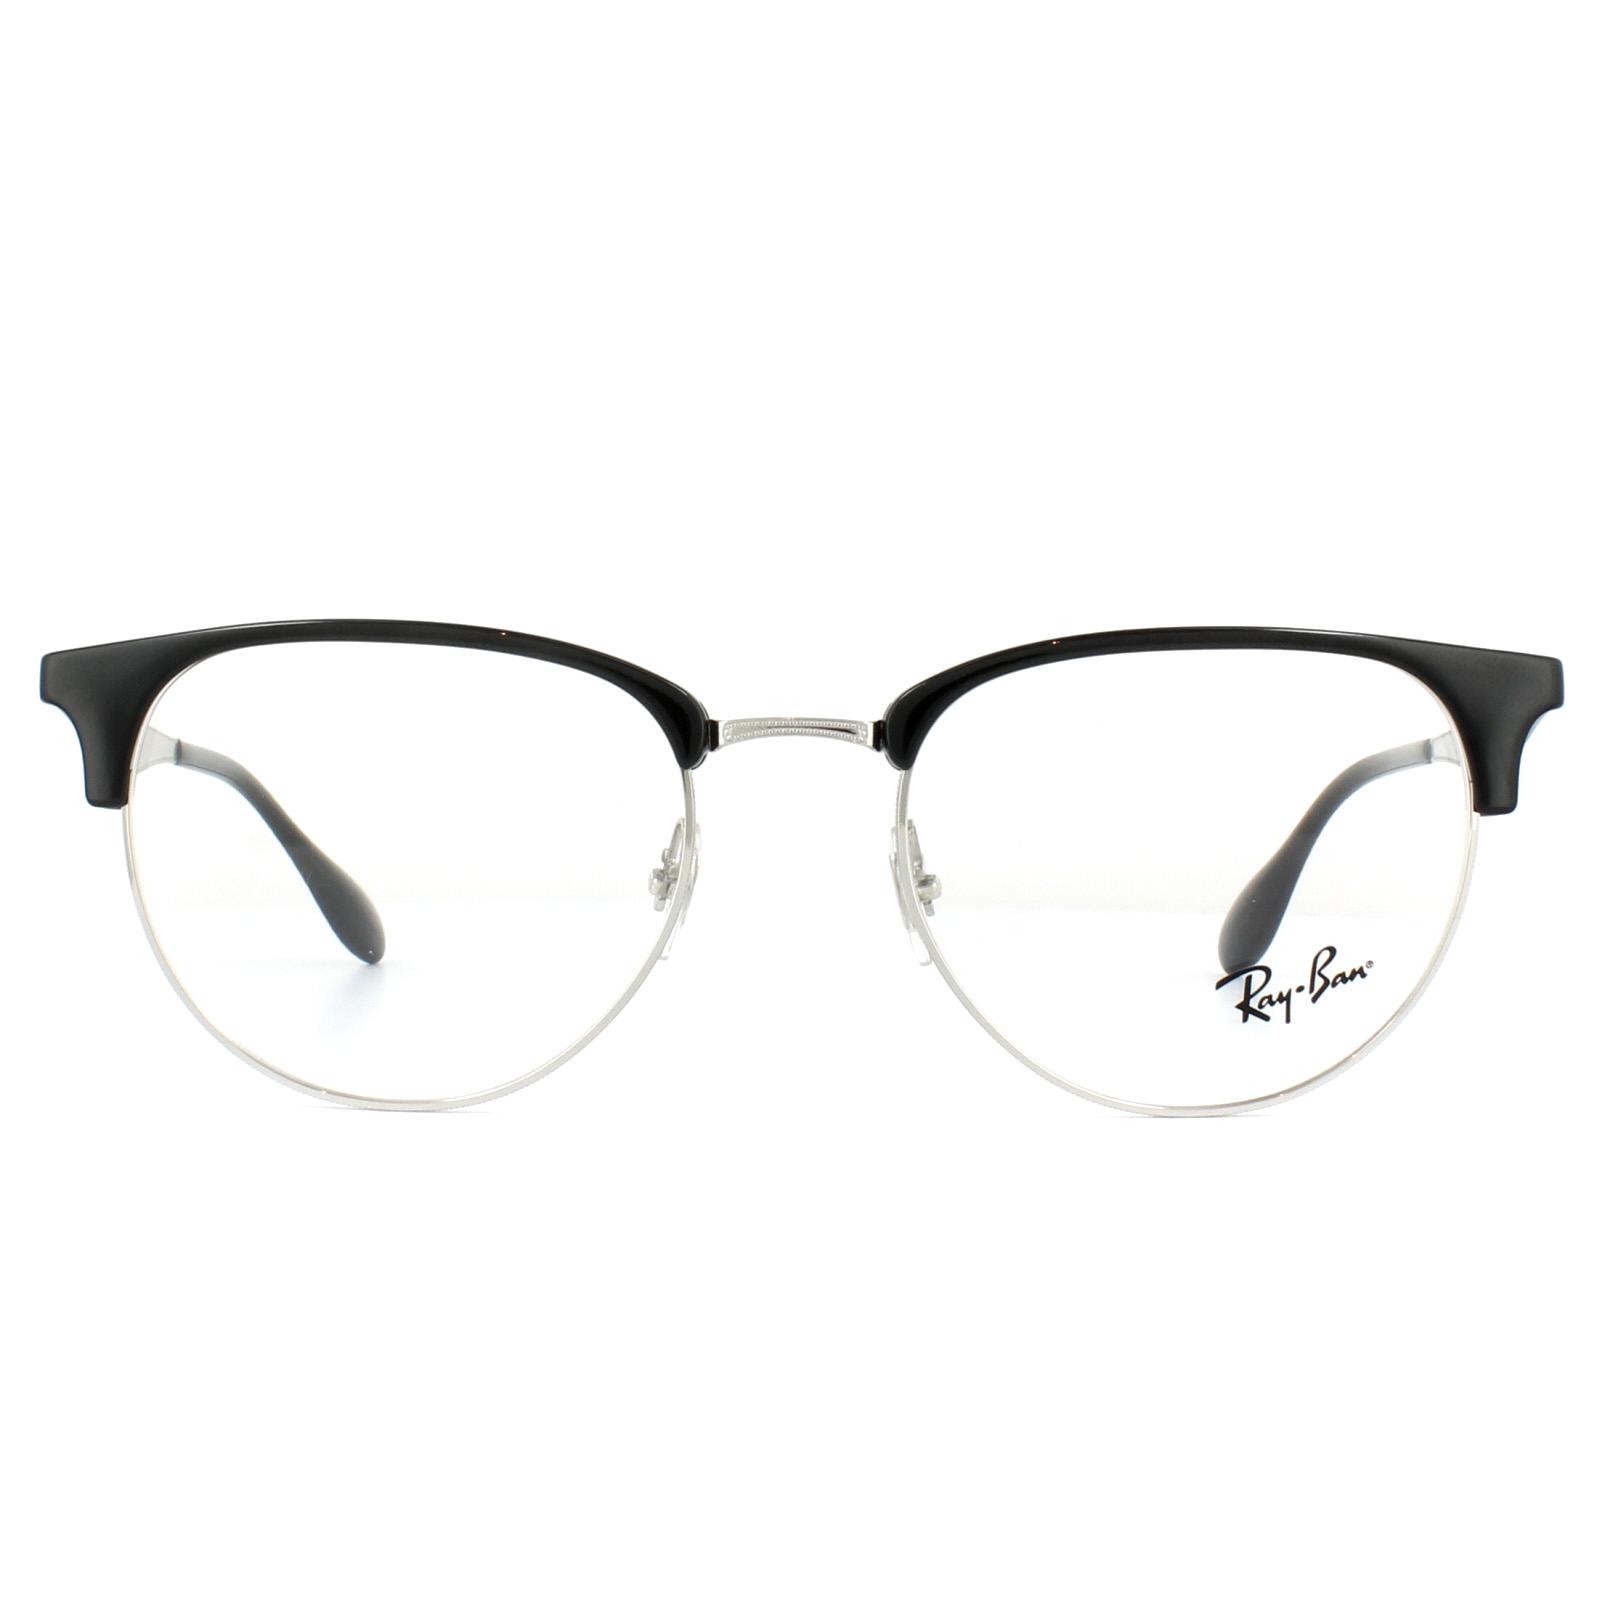 d8a50444471 Sentinel Ray-Ban Glasses Frames 6396 2932 Silver Black 53mm Mens